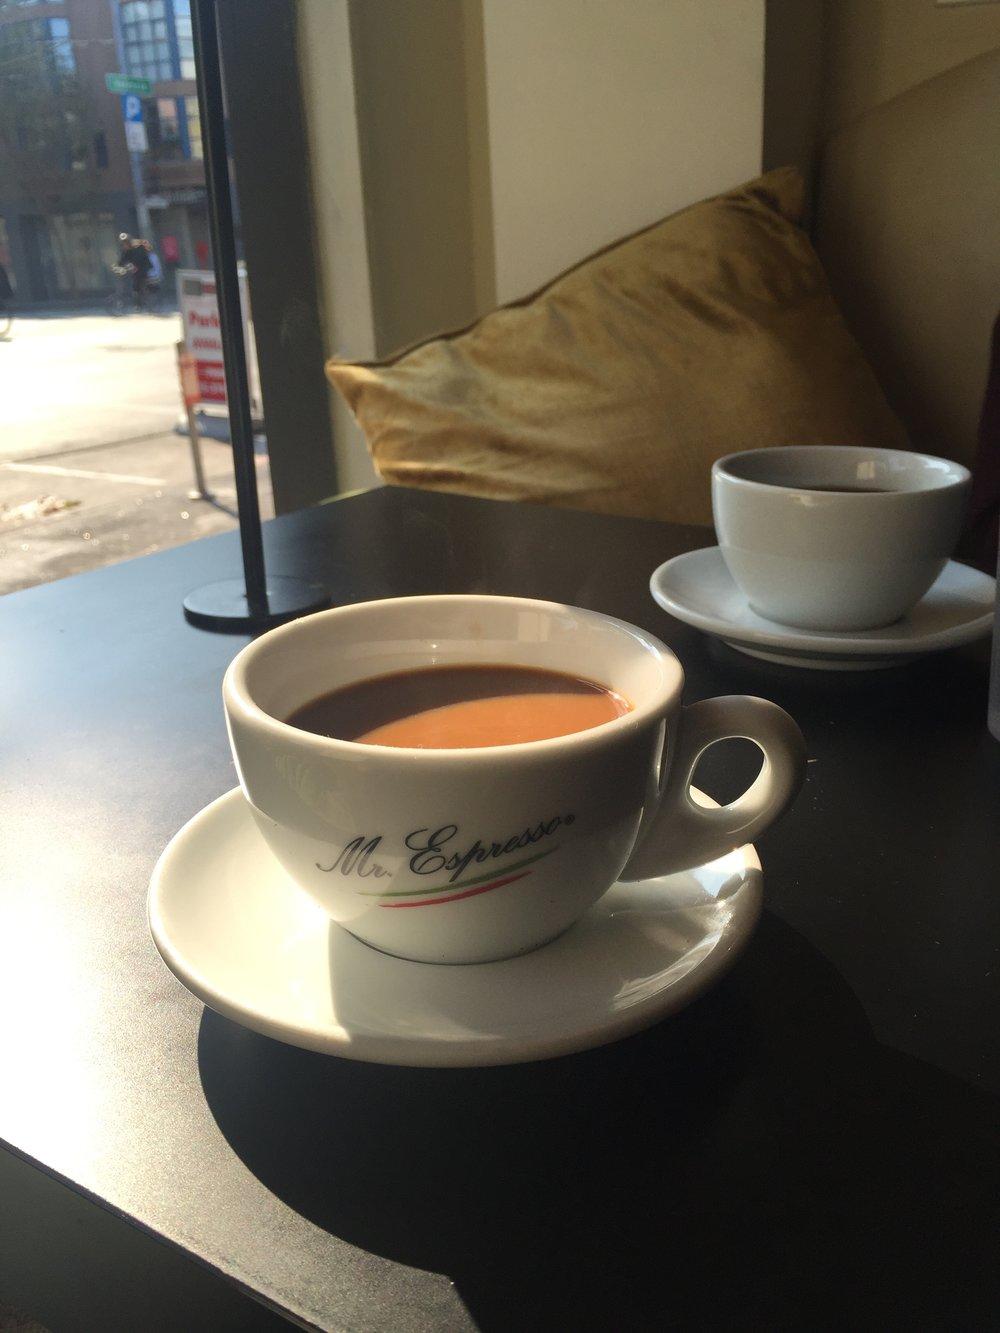 sanfrancisco,sanfranciscofood,cafe,food,breakfast,blogger,lasvegas,lasvegasblogger